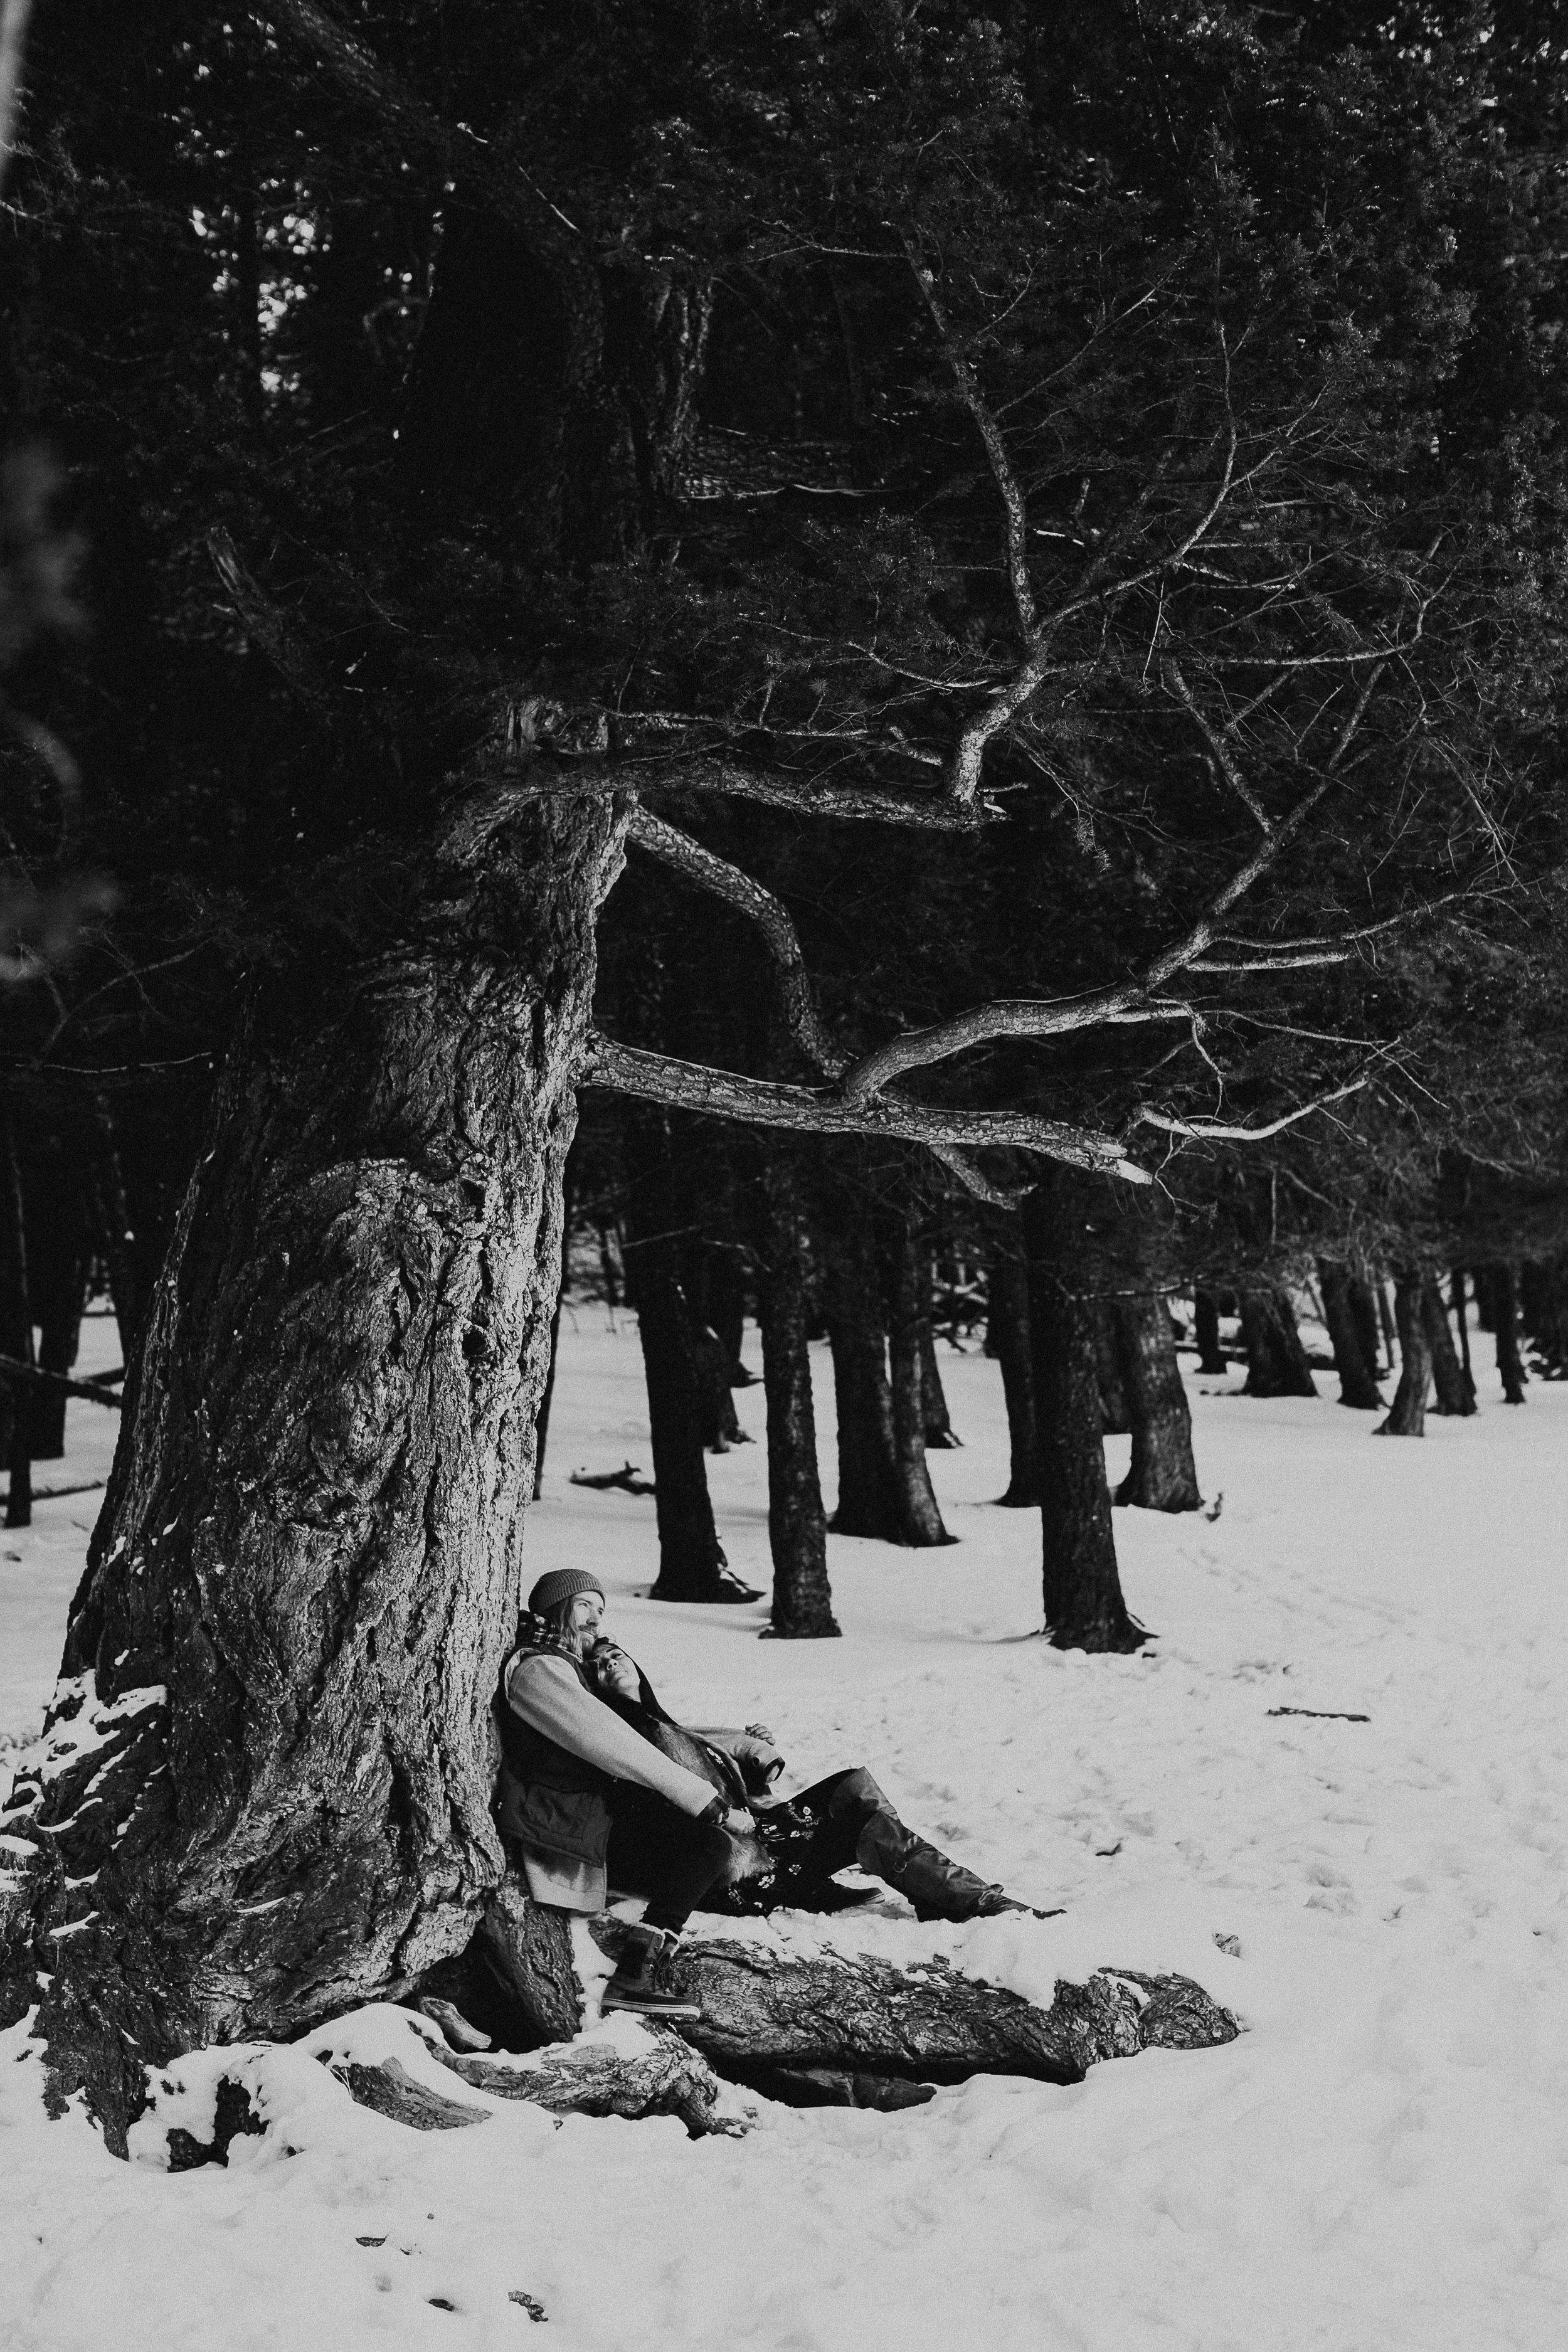 Banff Engagement Photographer - Winter Mountain Adventure Engagement Session - Michelle Larmand Photography-060